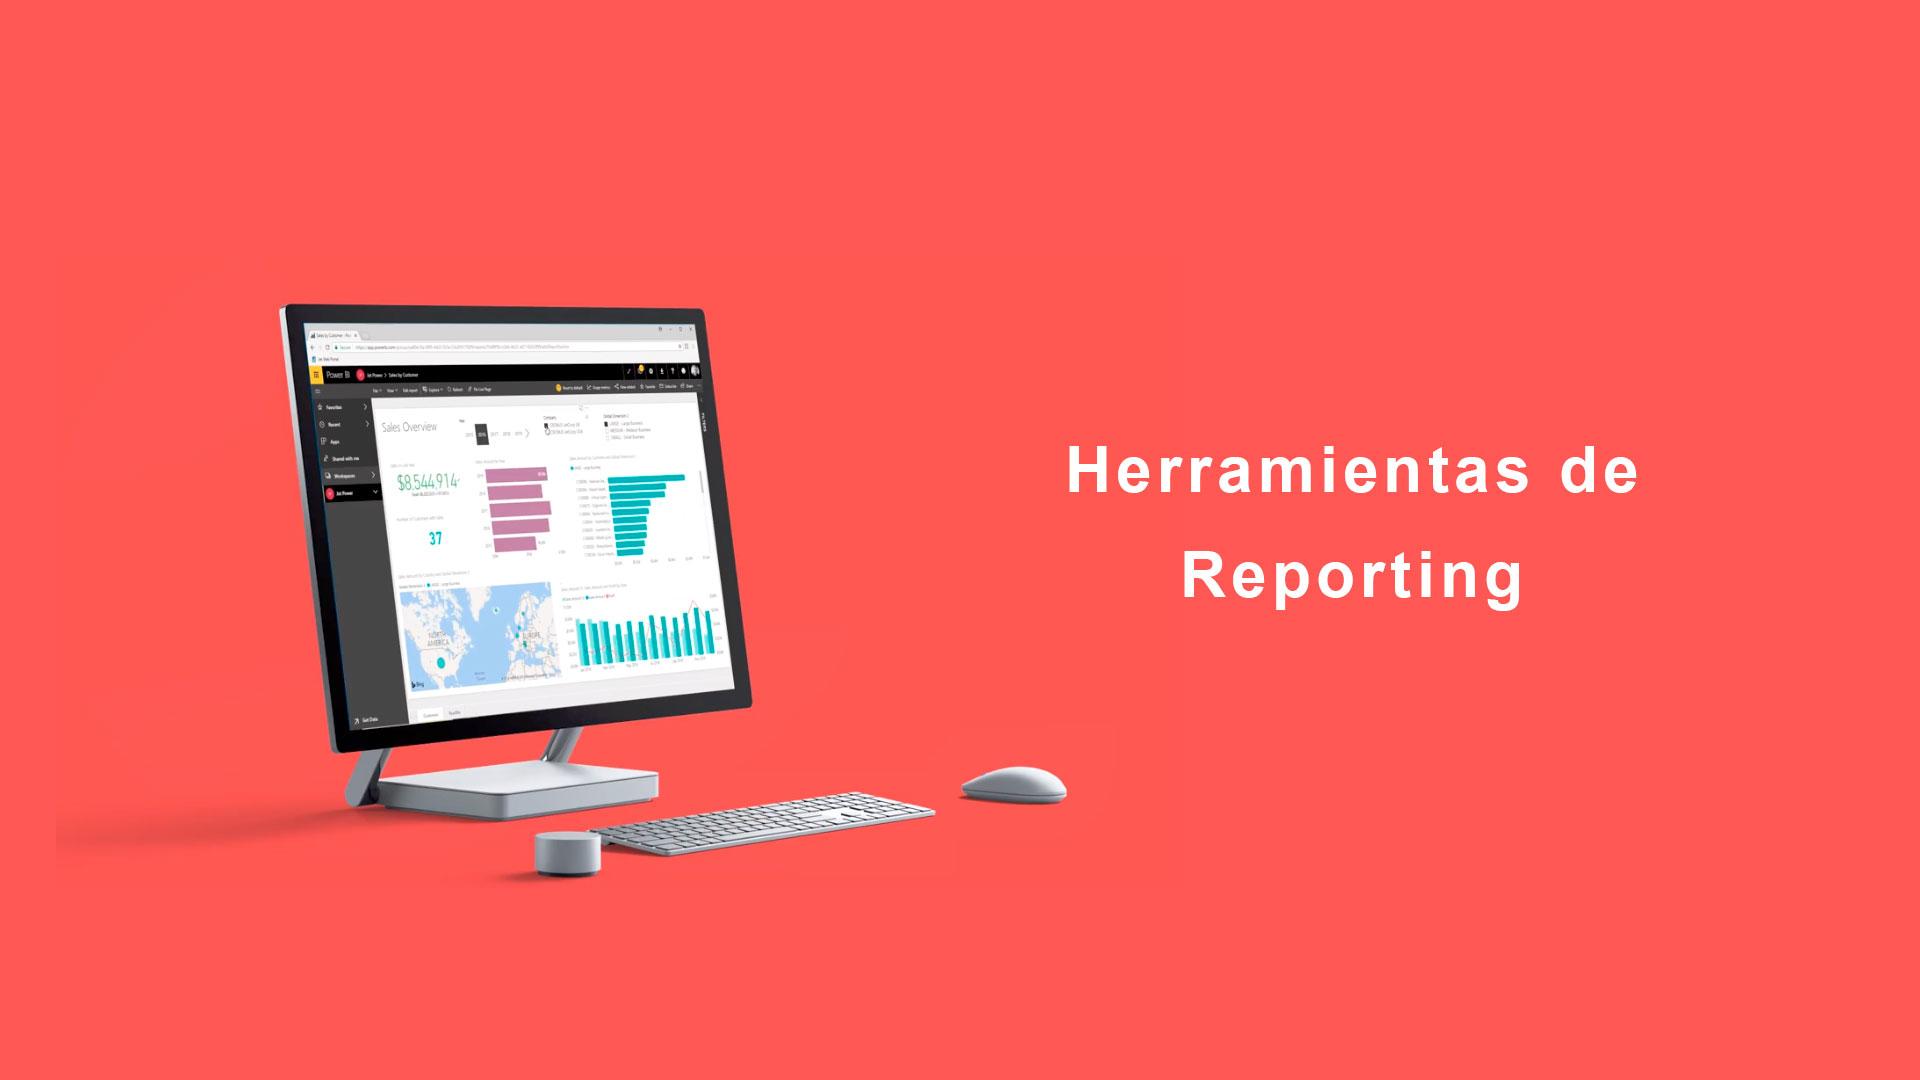 heramientas de reporting